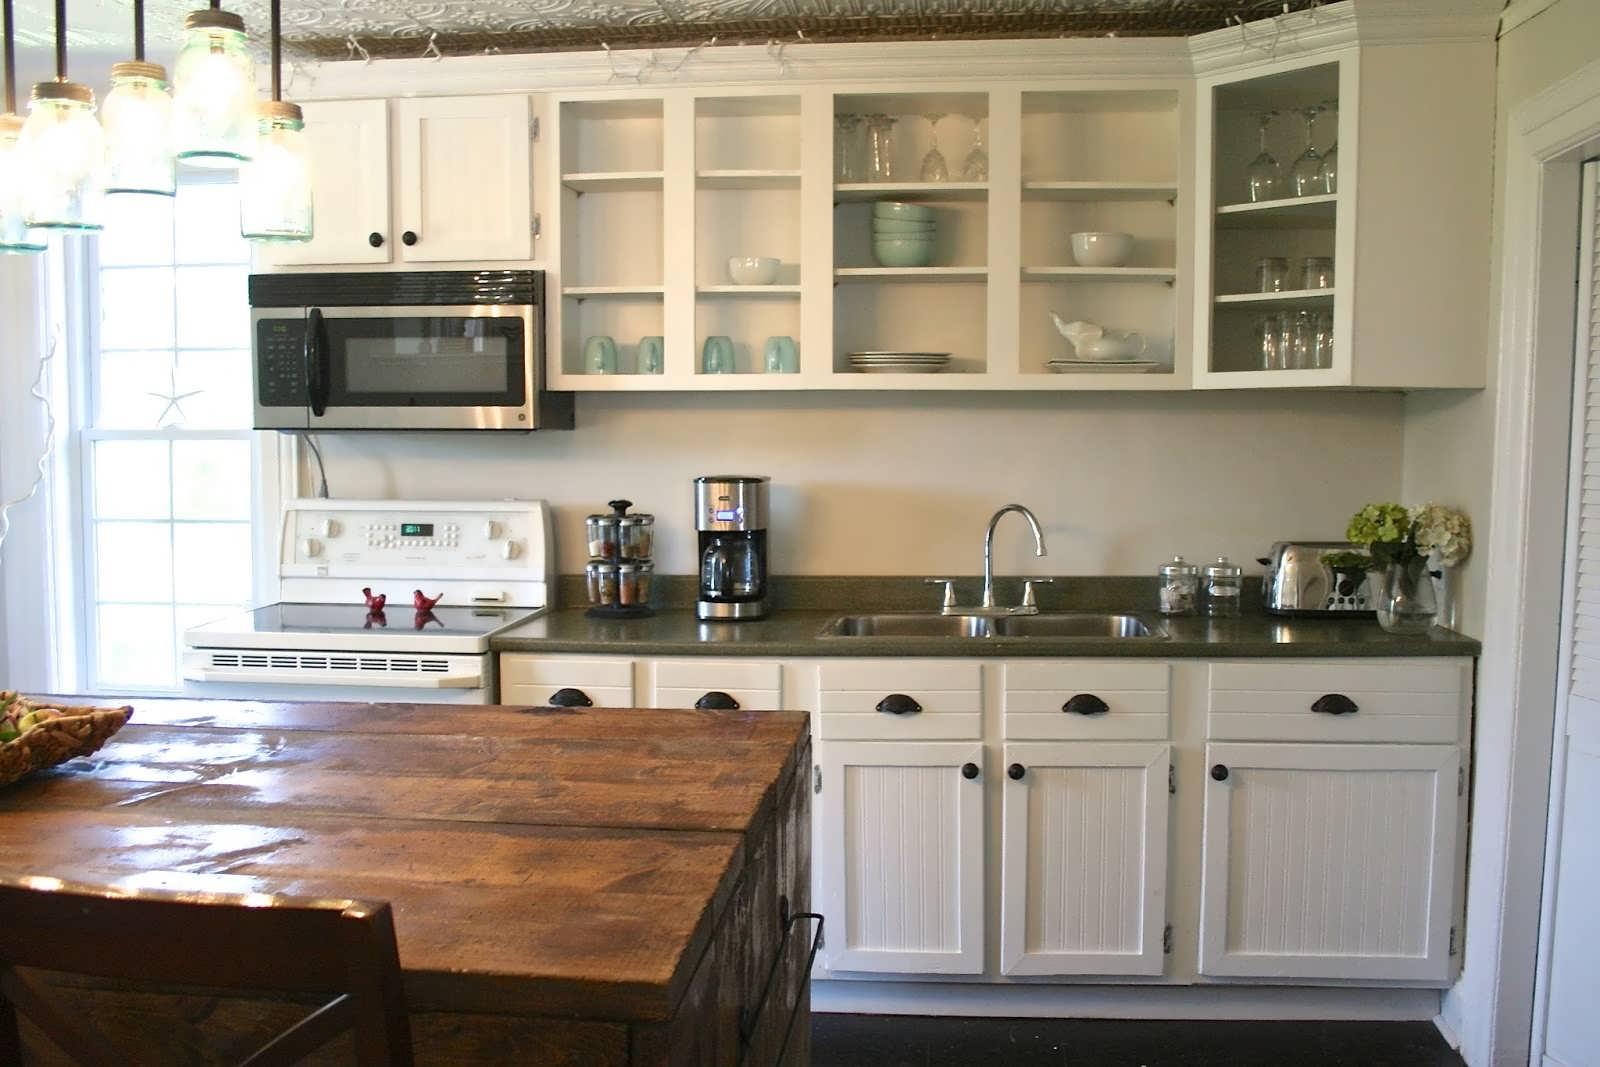 Older Home Kitchen Remodeling Ideas   Roy Home Design on Small:_Tken7Avcza= Kitchen Renovation Ideas  id=41494